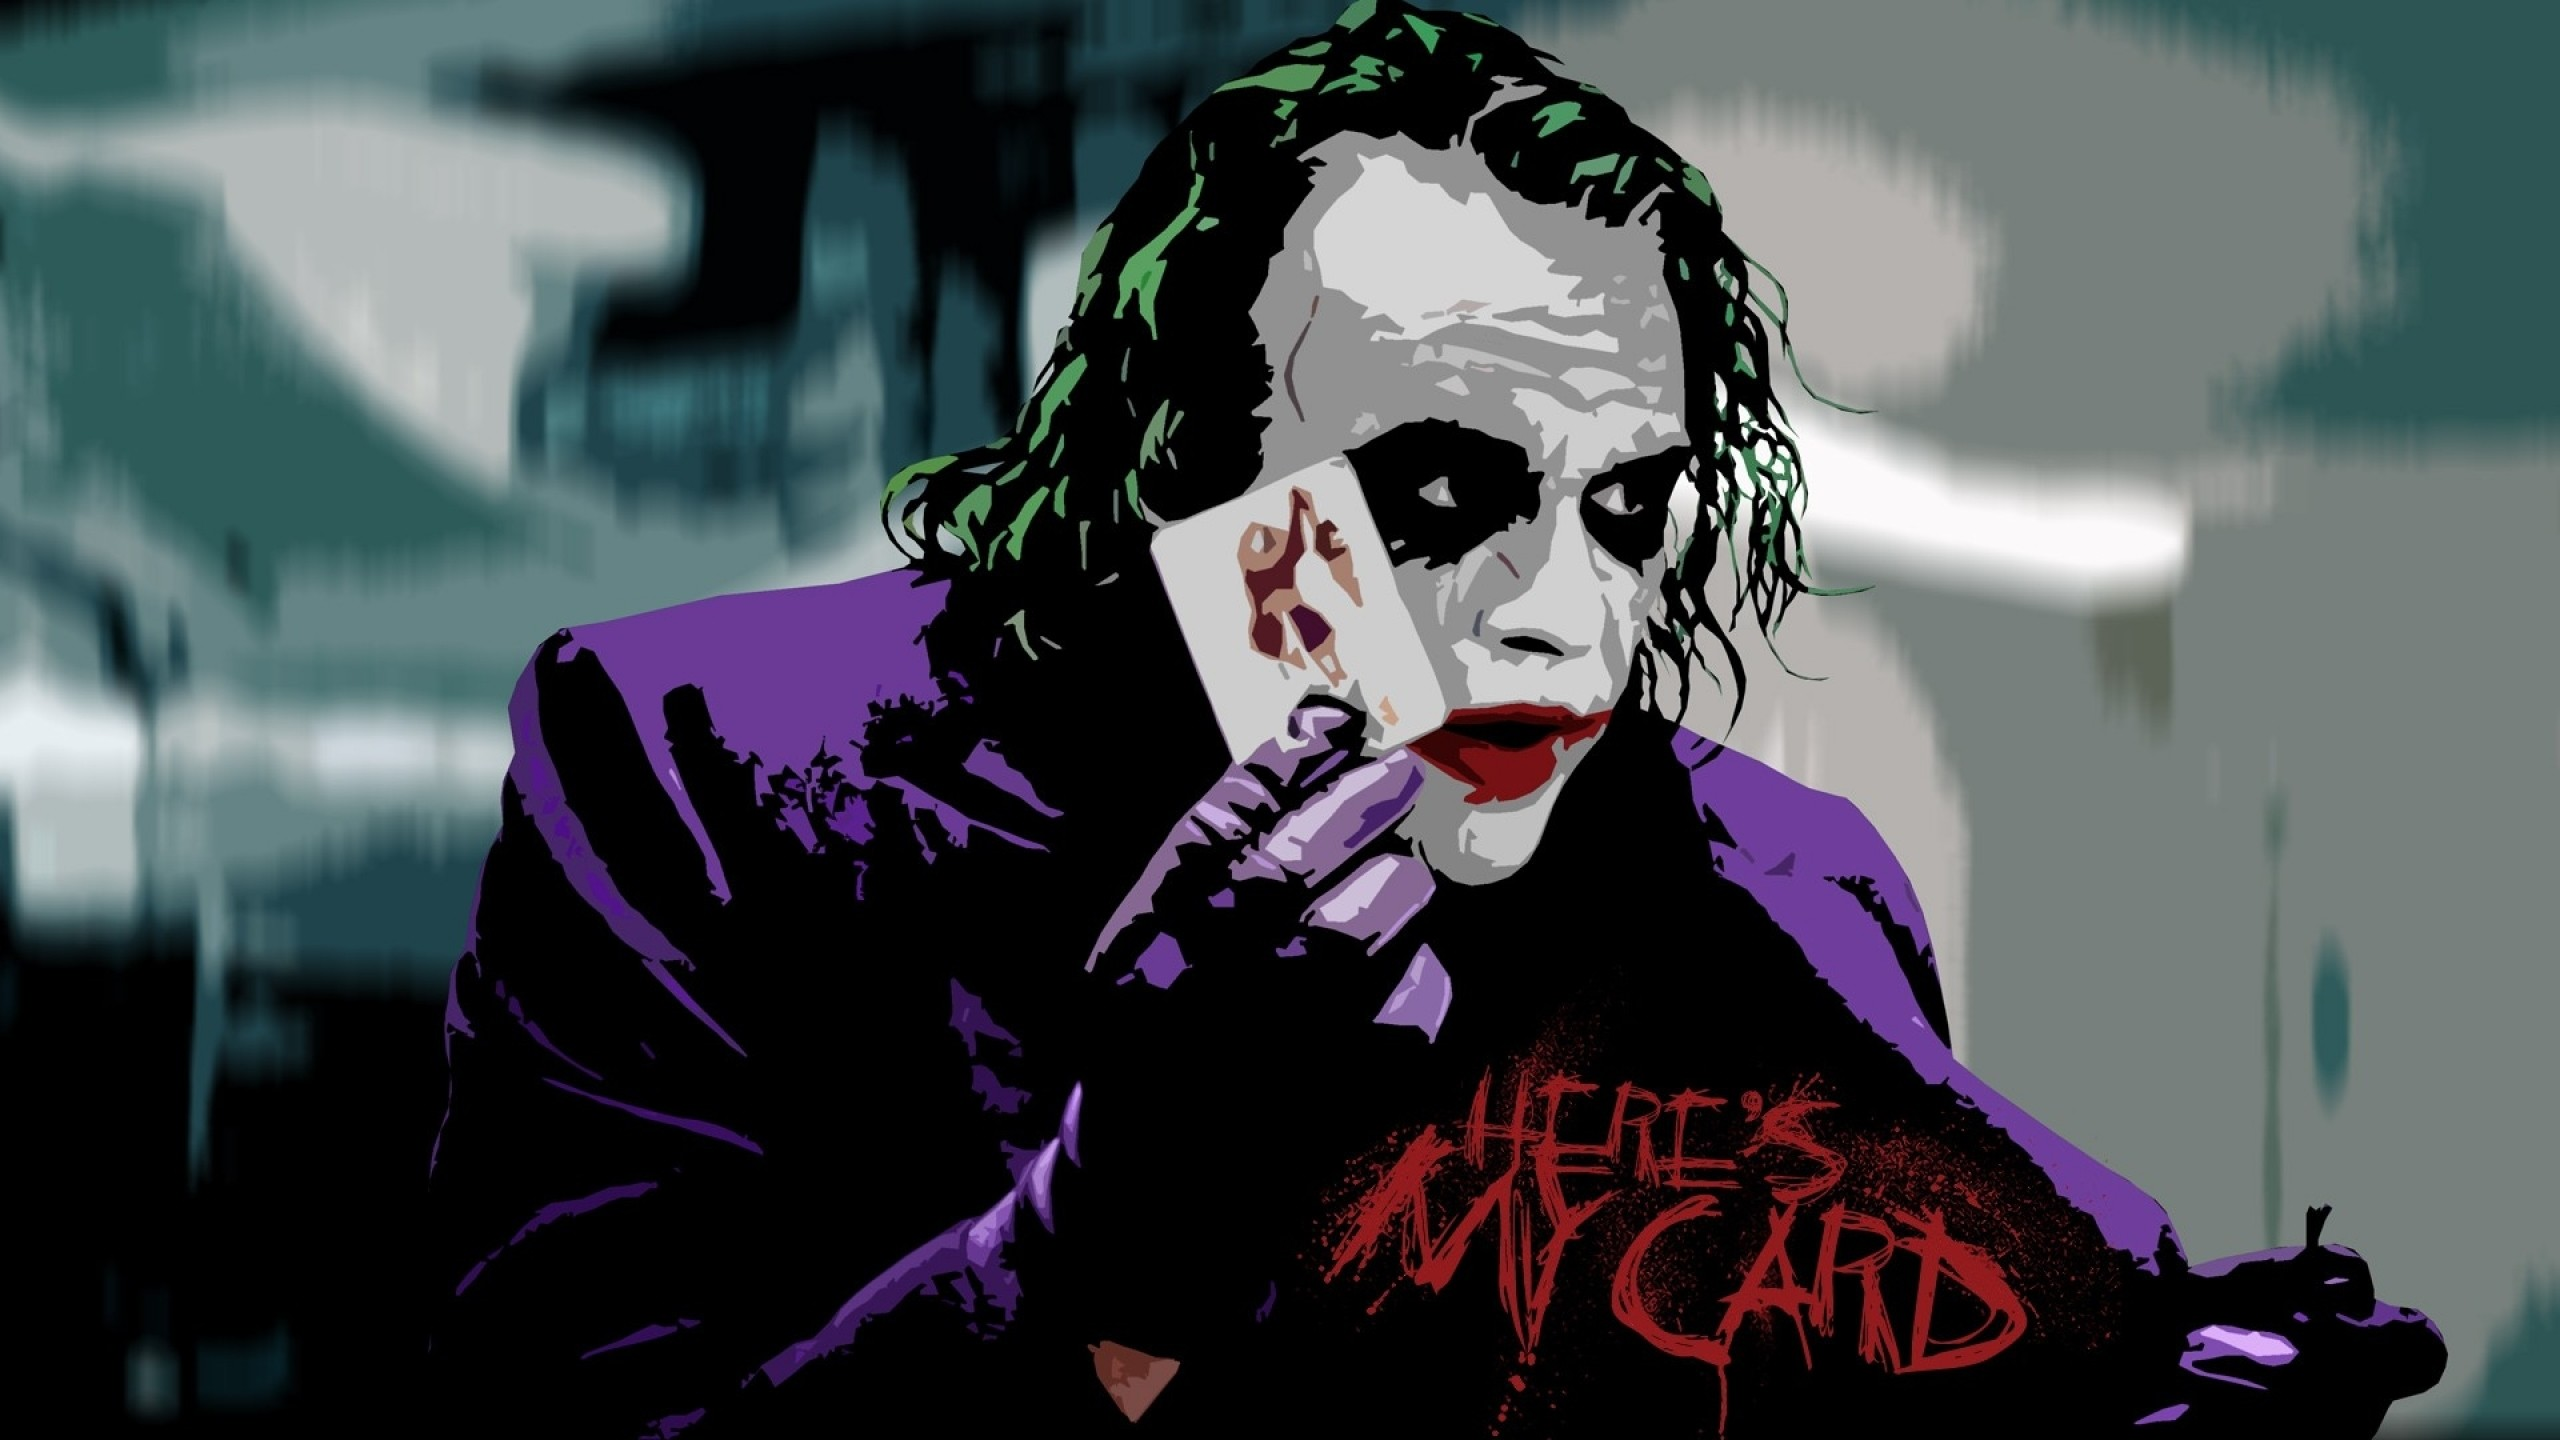 cards batman quotes the joker typography batman the dark knight 1920×1080  wallpaper Art HD Wallpaper